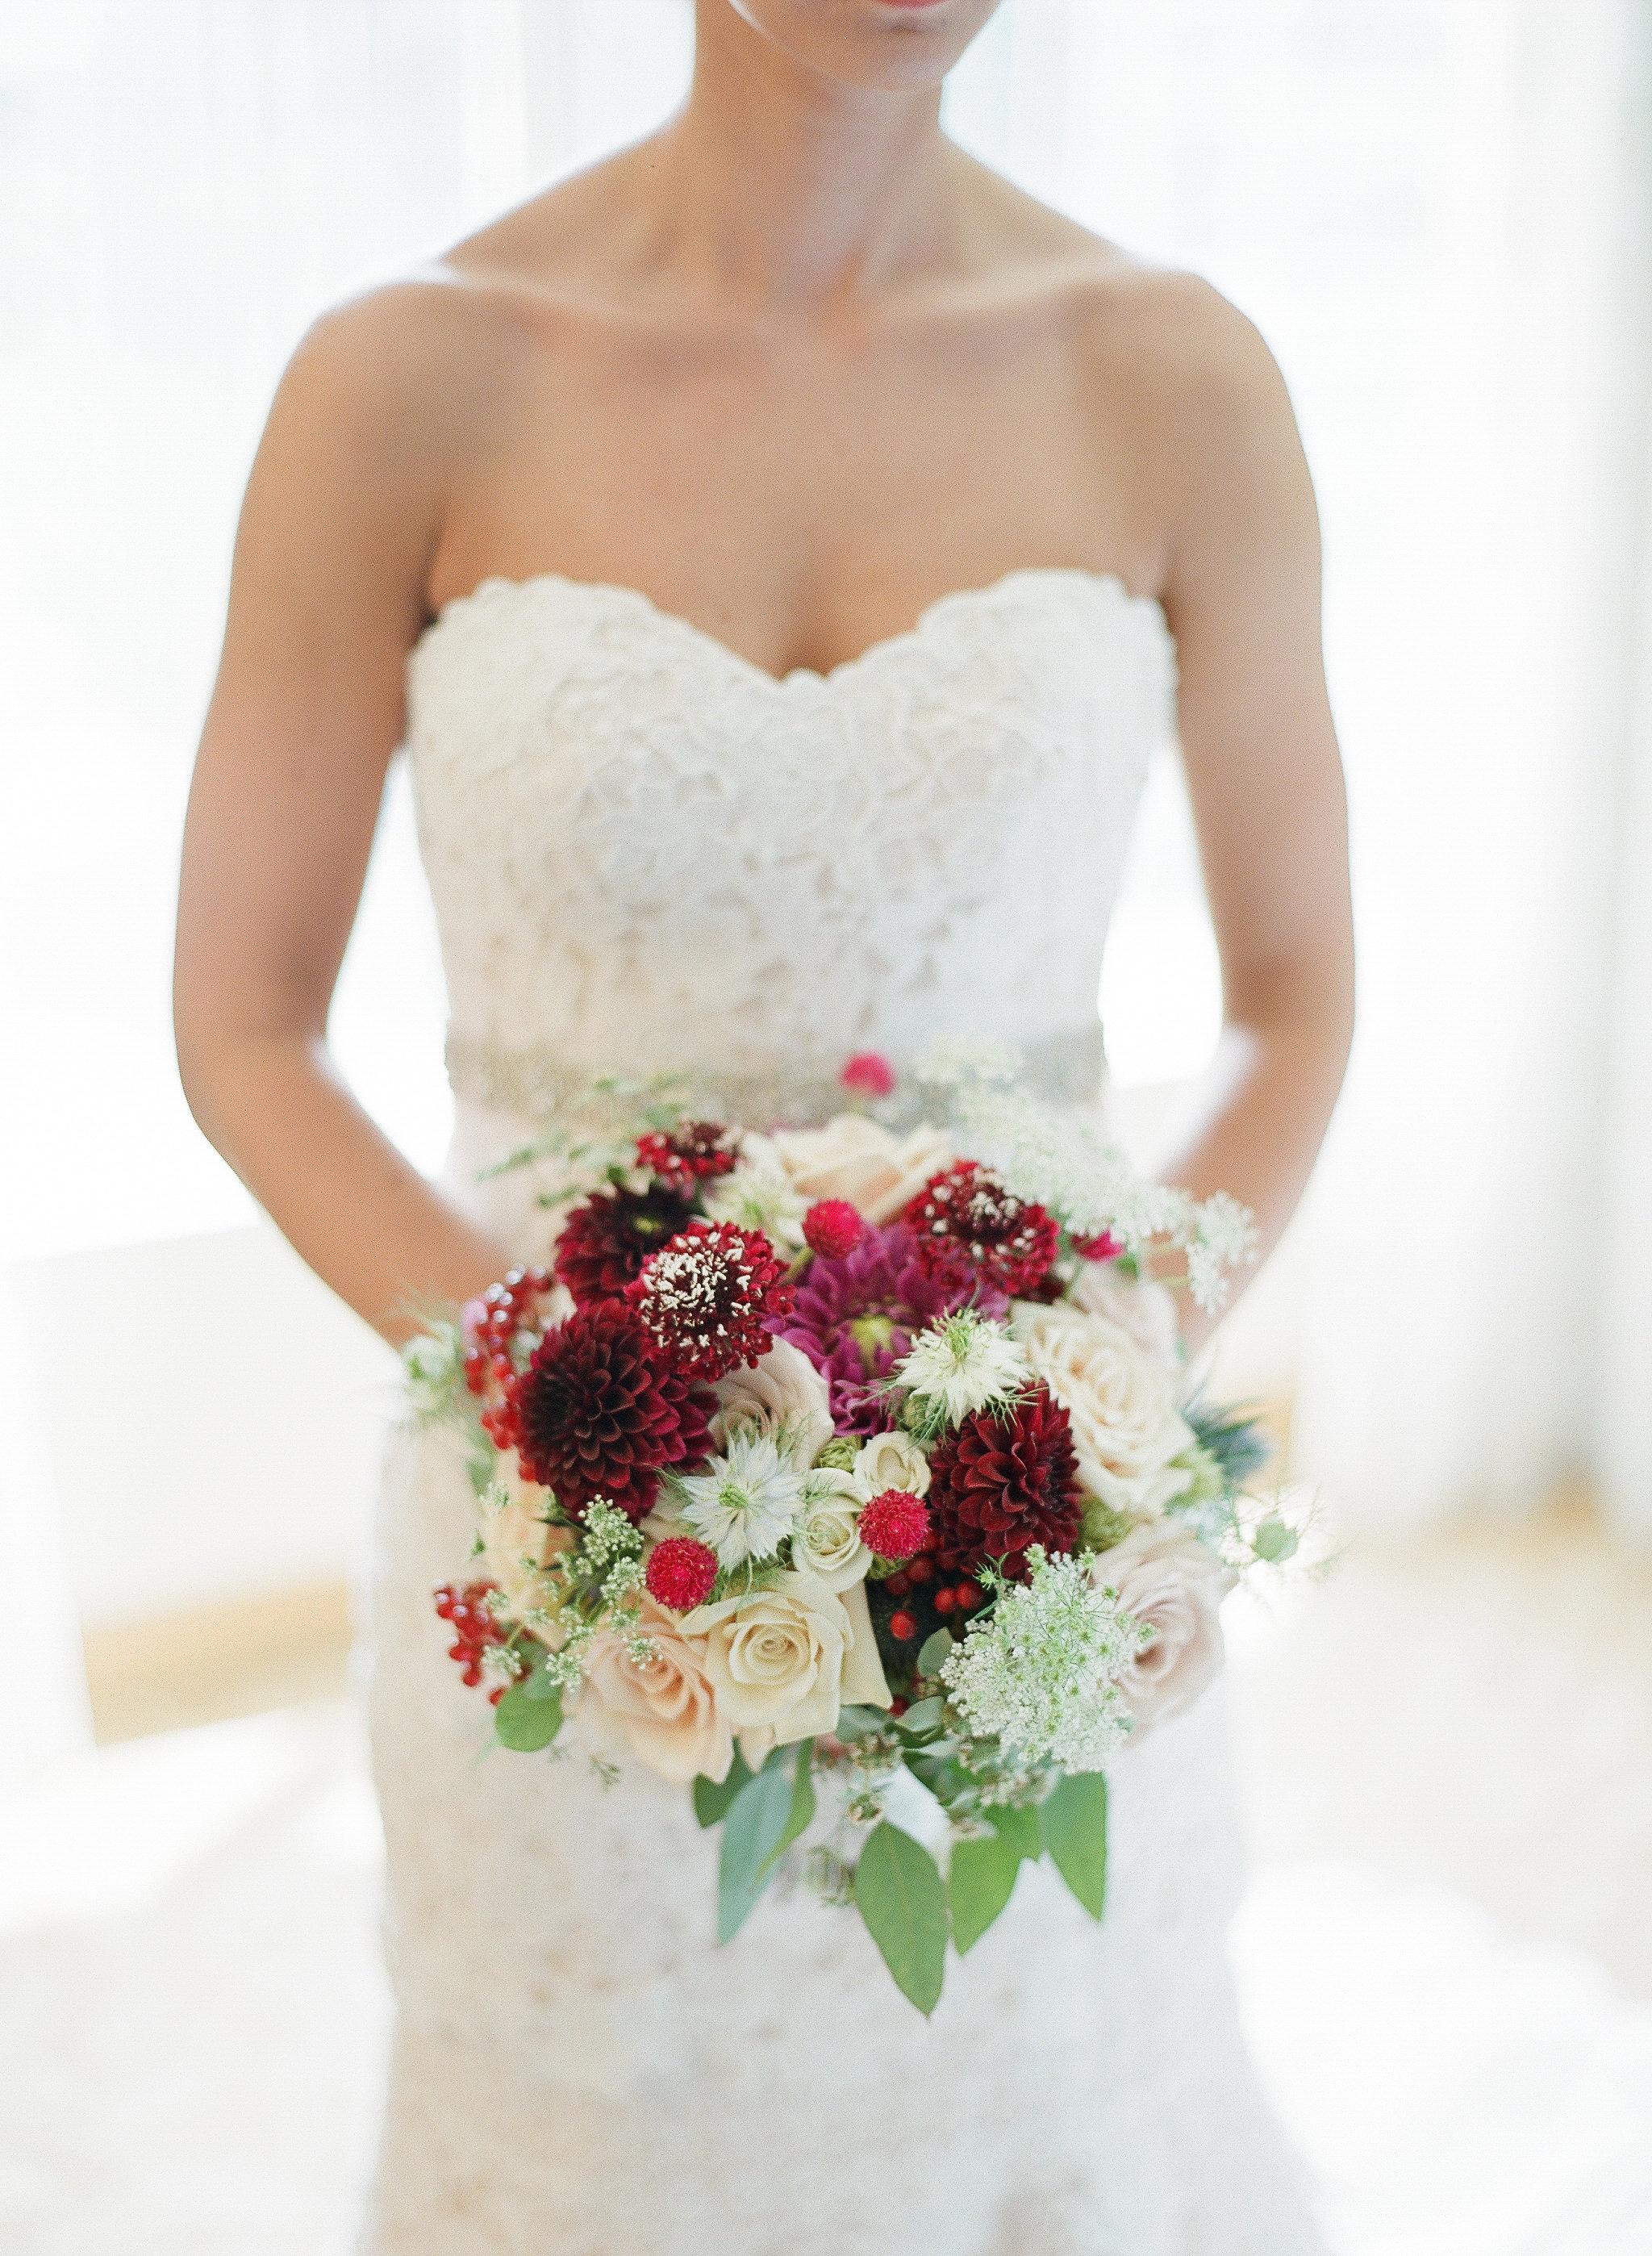 photography:markandrewstudios.com